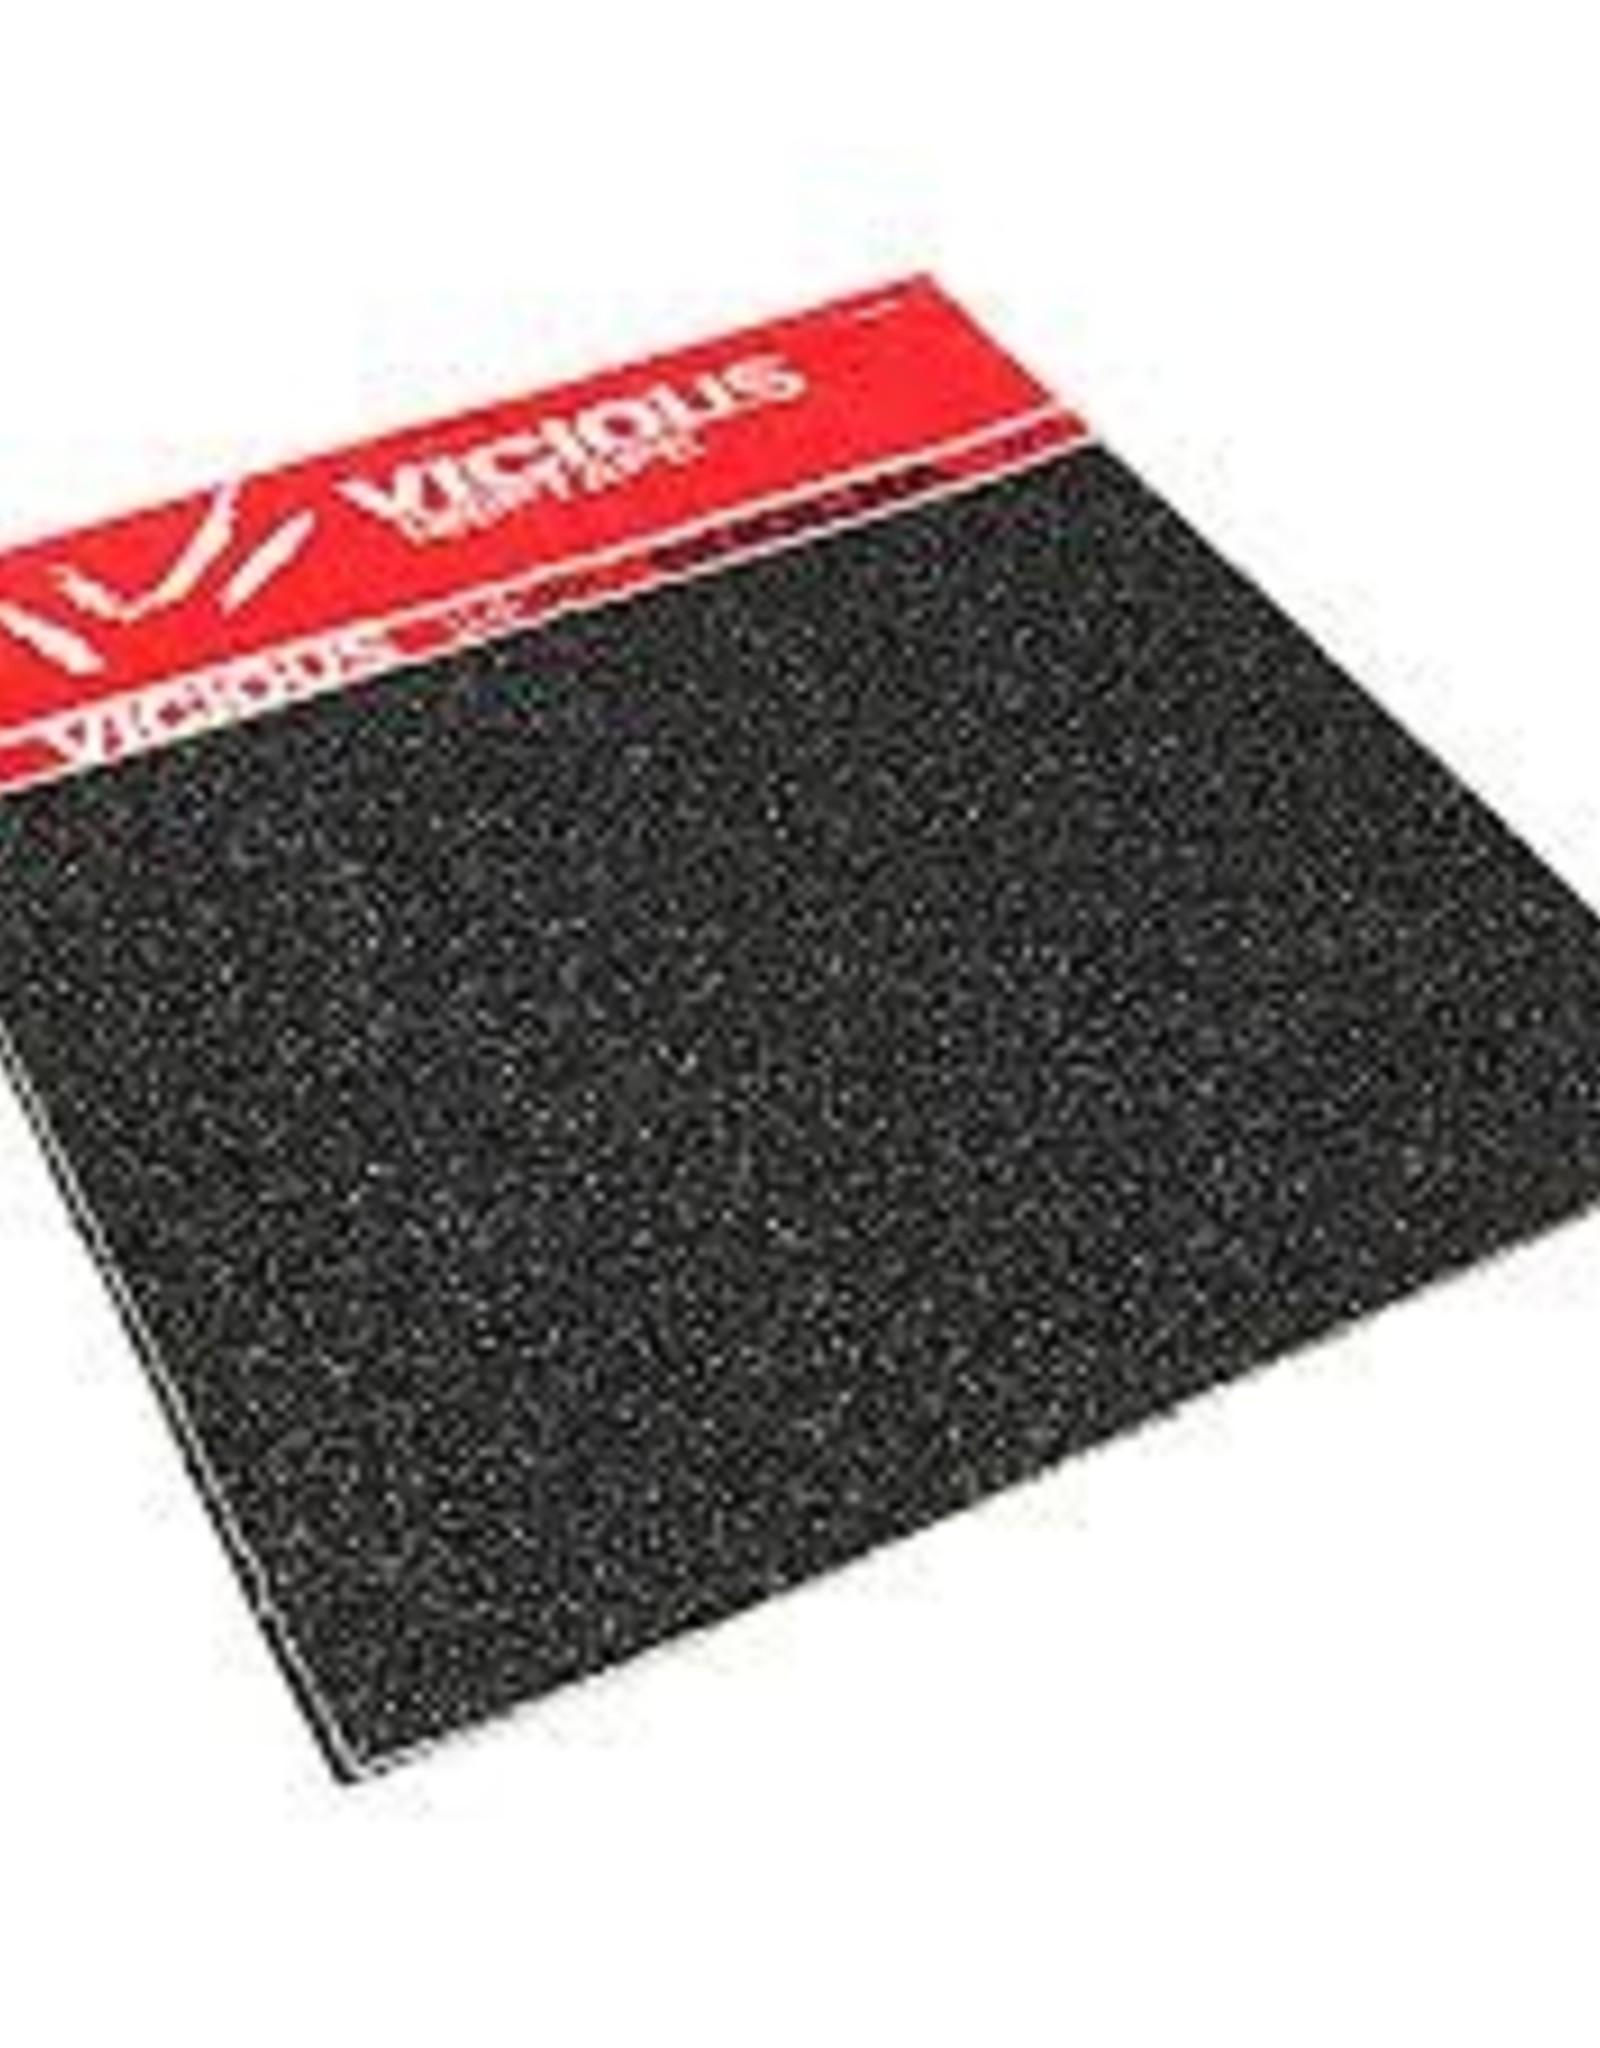 Vicious Griptape Black Sheets